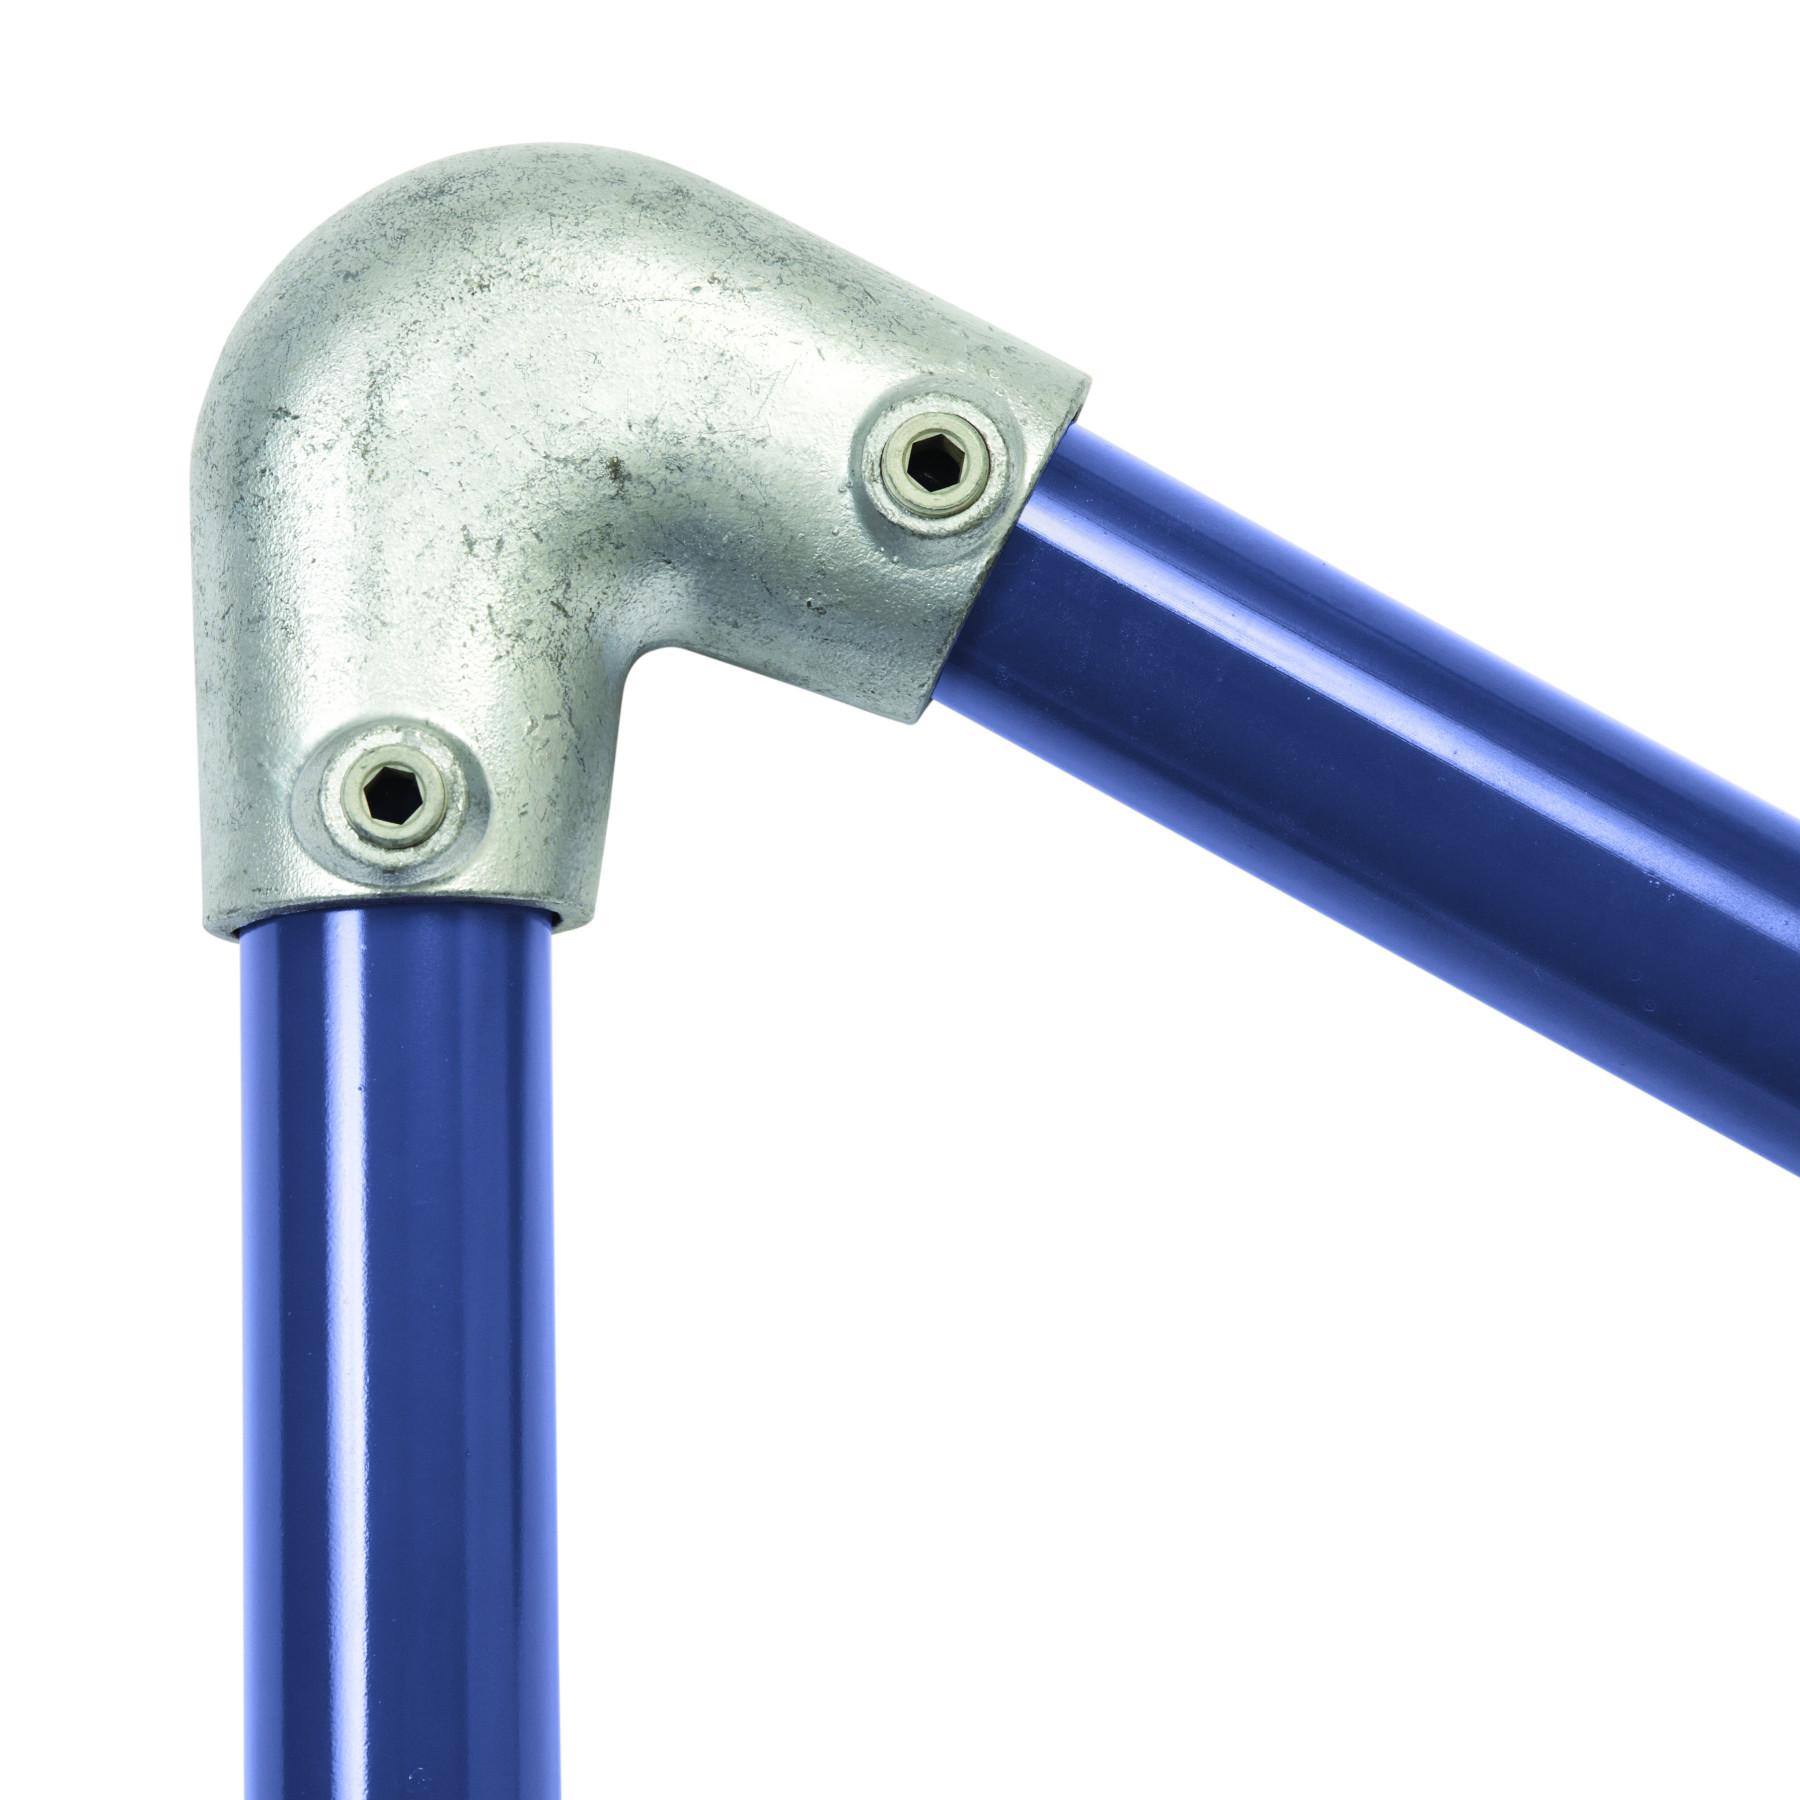 Kee klamp a acute angle elbow key clamp simplified